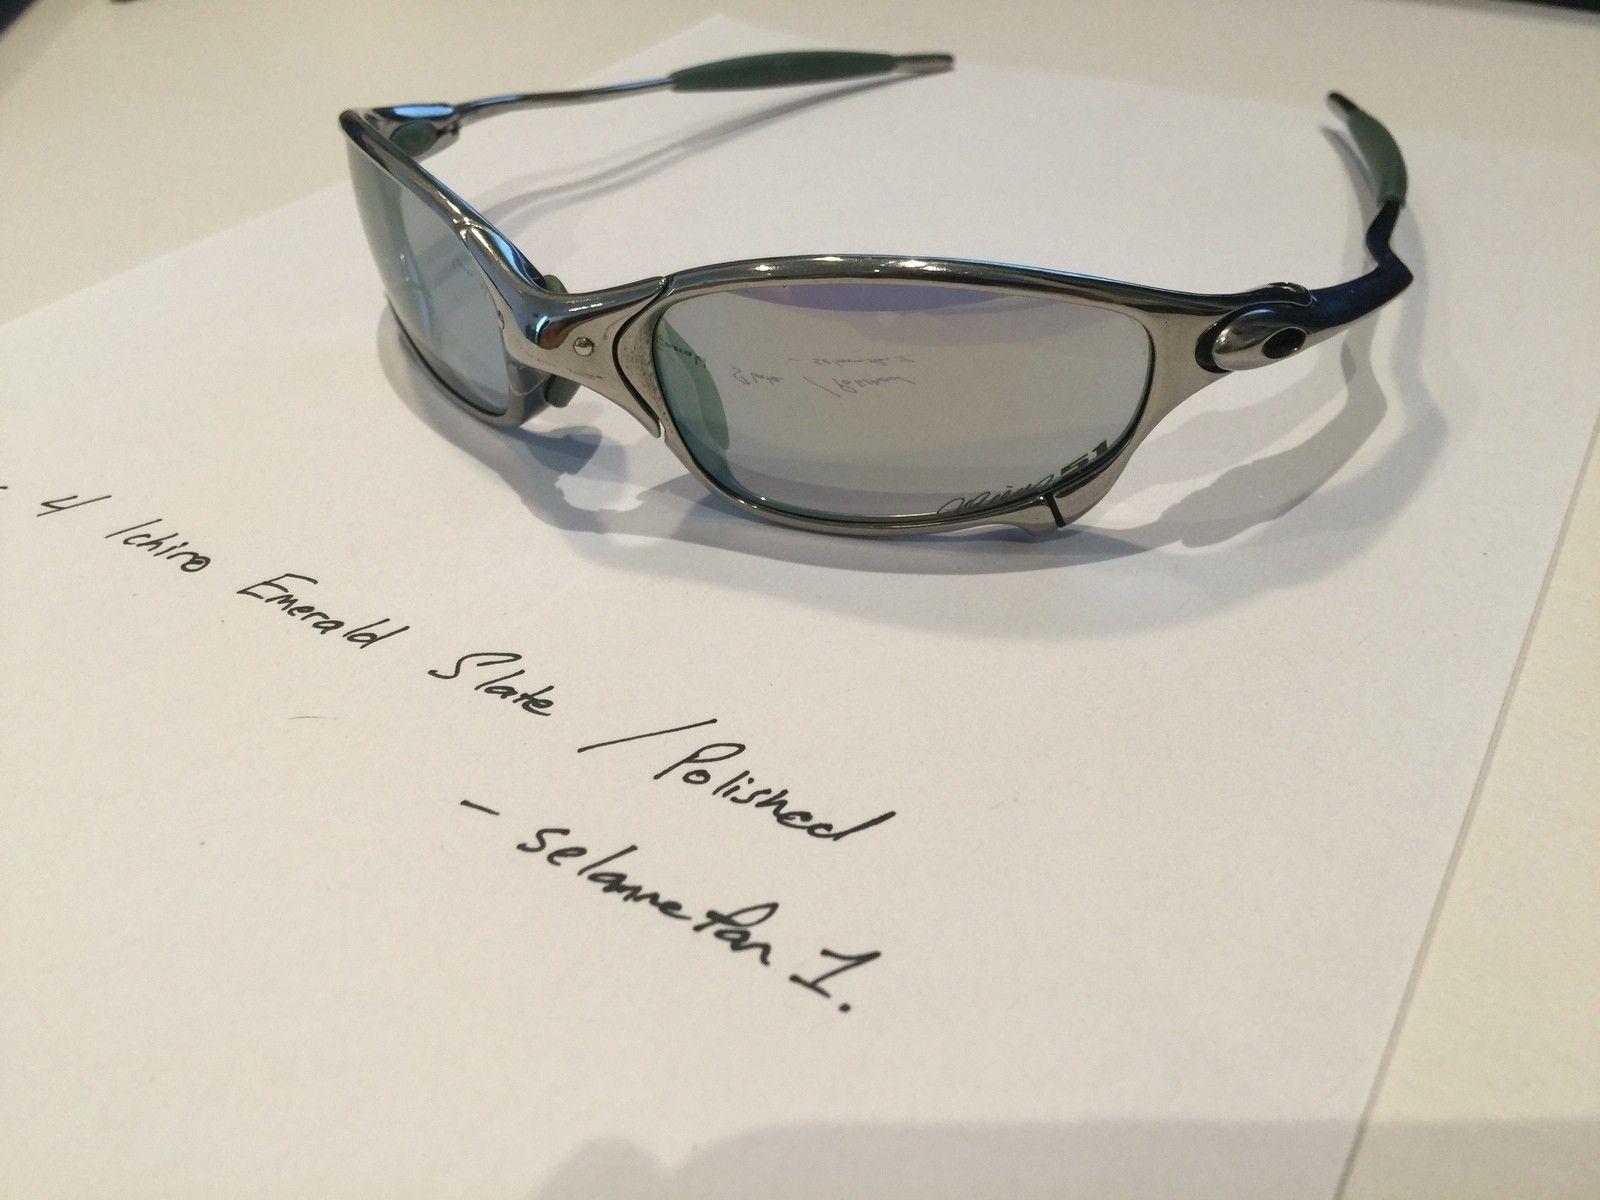 Ichiro Emerald Slate / Polished Frame Juliets (with box) - IMG_3816.JPG